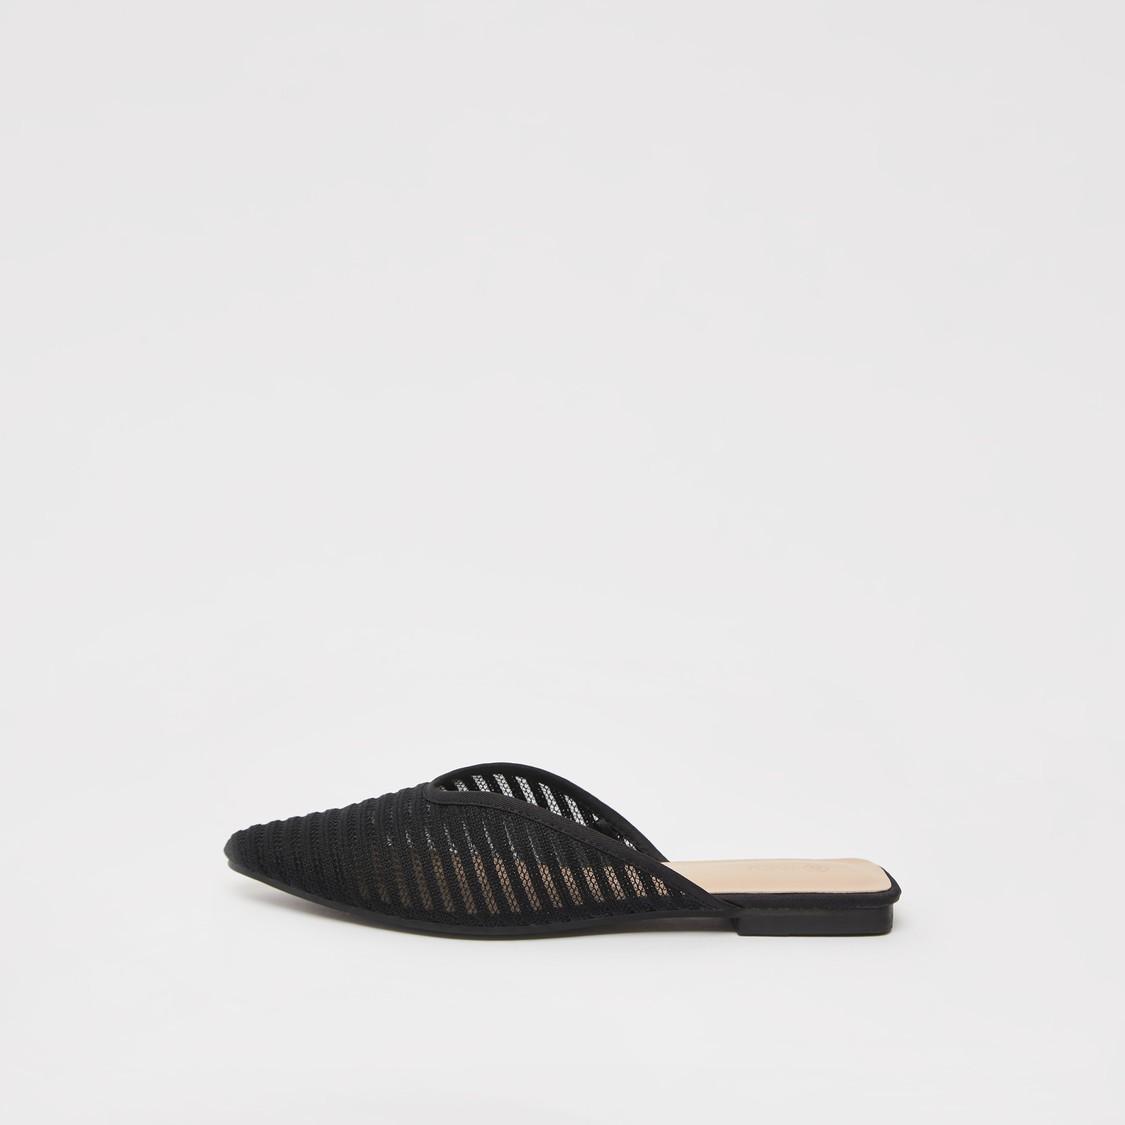 Textured Flat Heel Mules